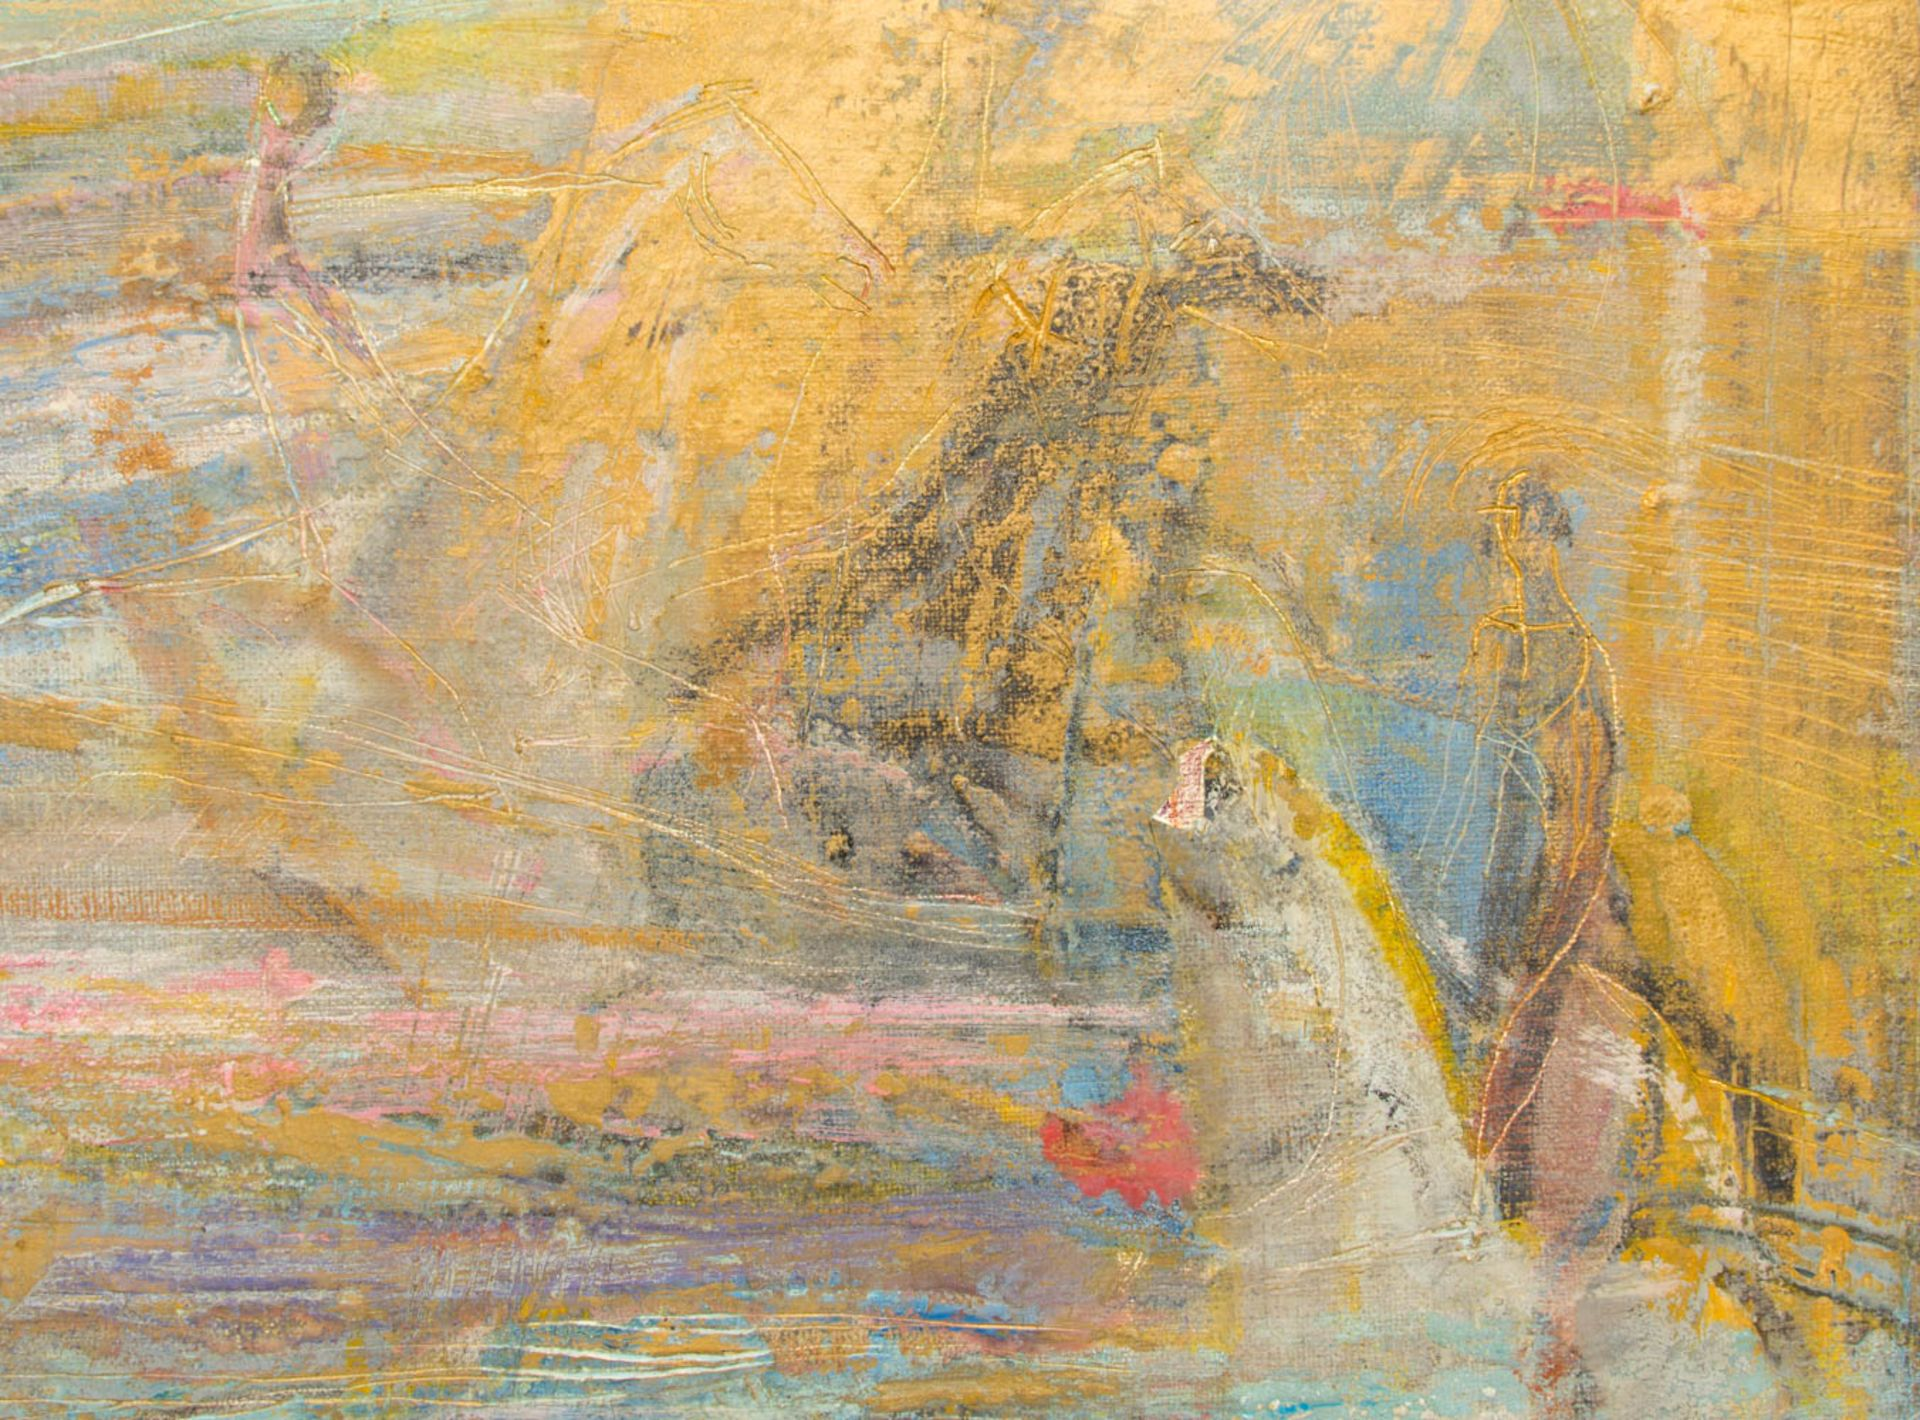 Abstrakte Komposition, Enkaustik auf Leinwand.Signiert unten rechts, gerahmt.Rück - Bild 2 aus 4